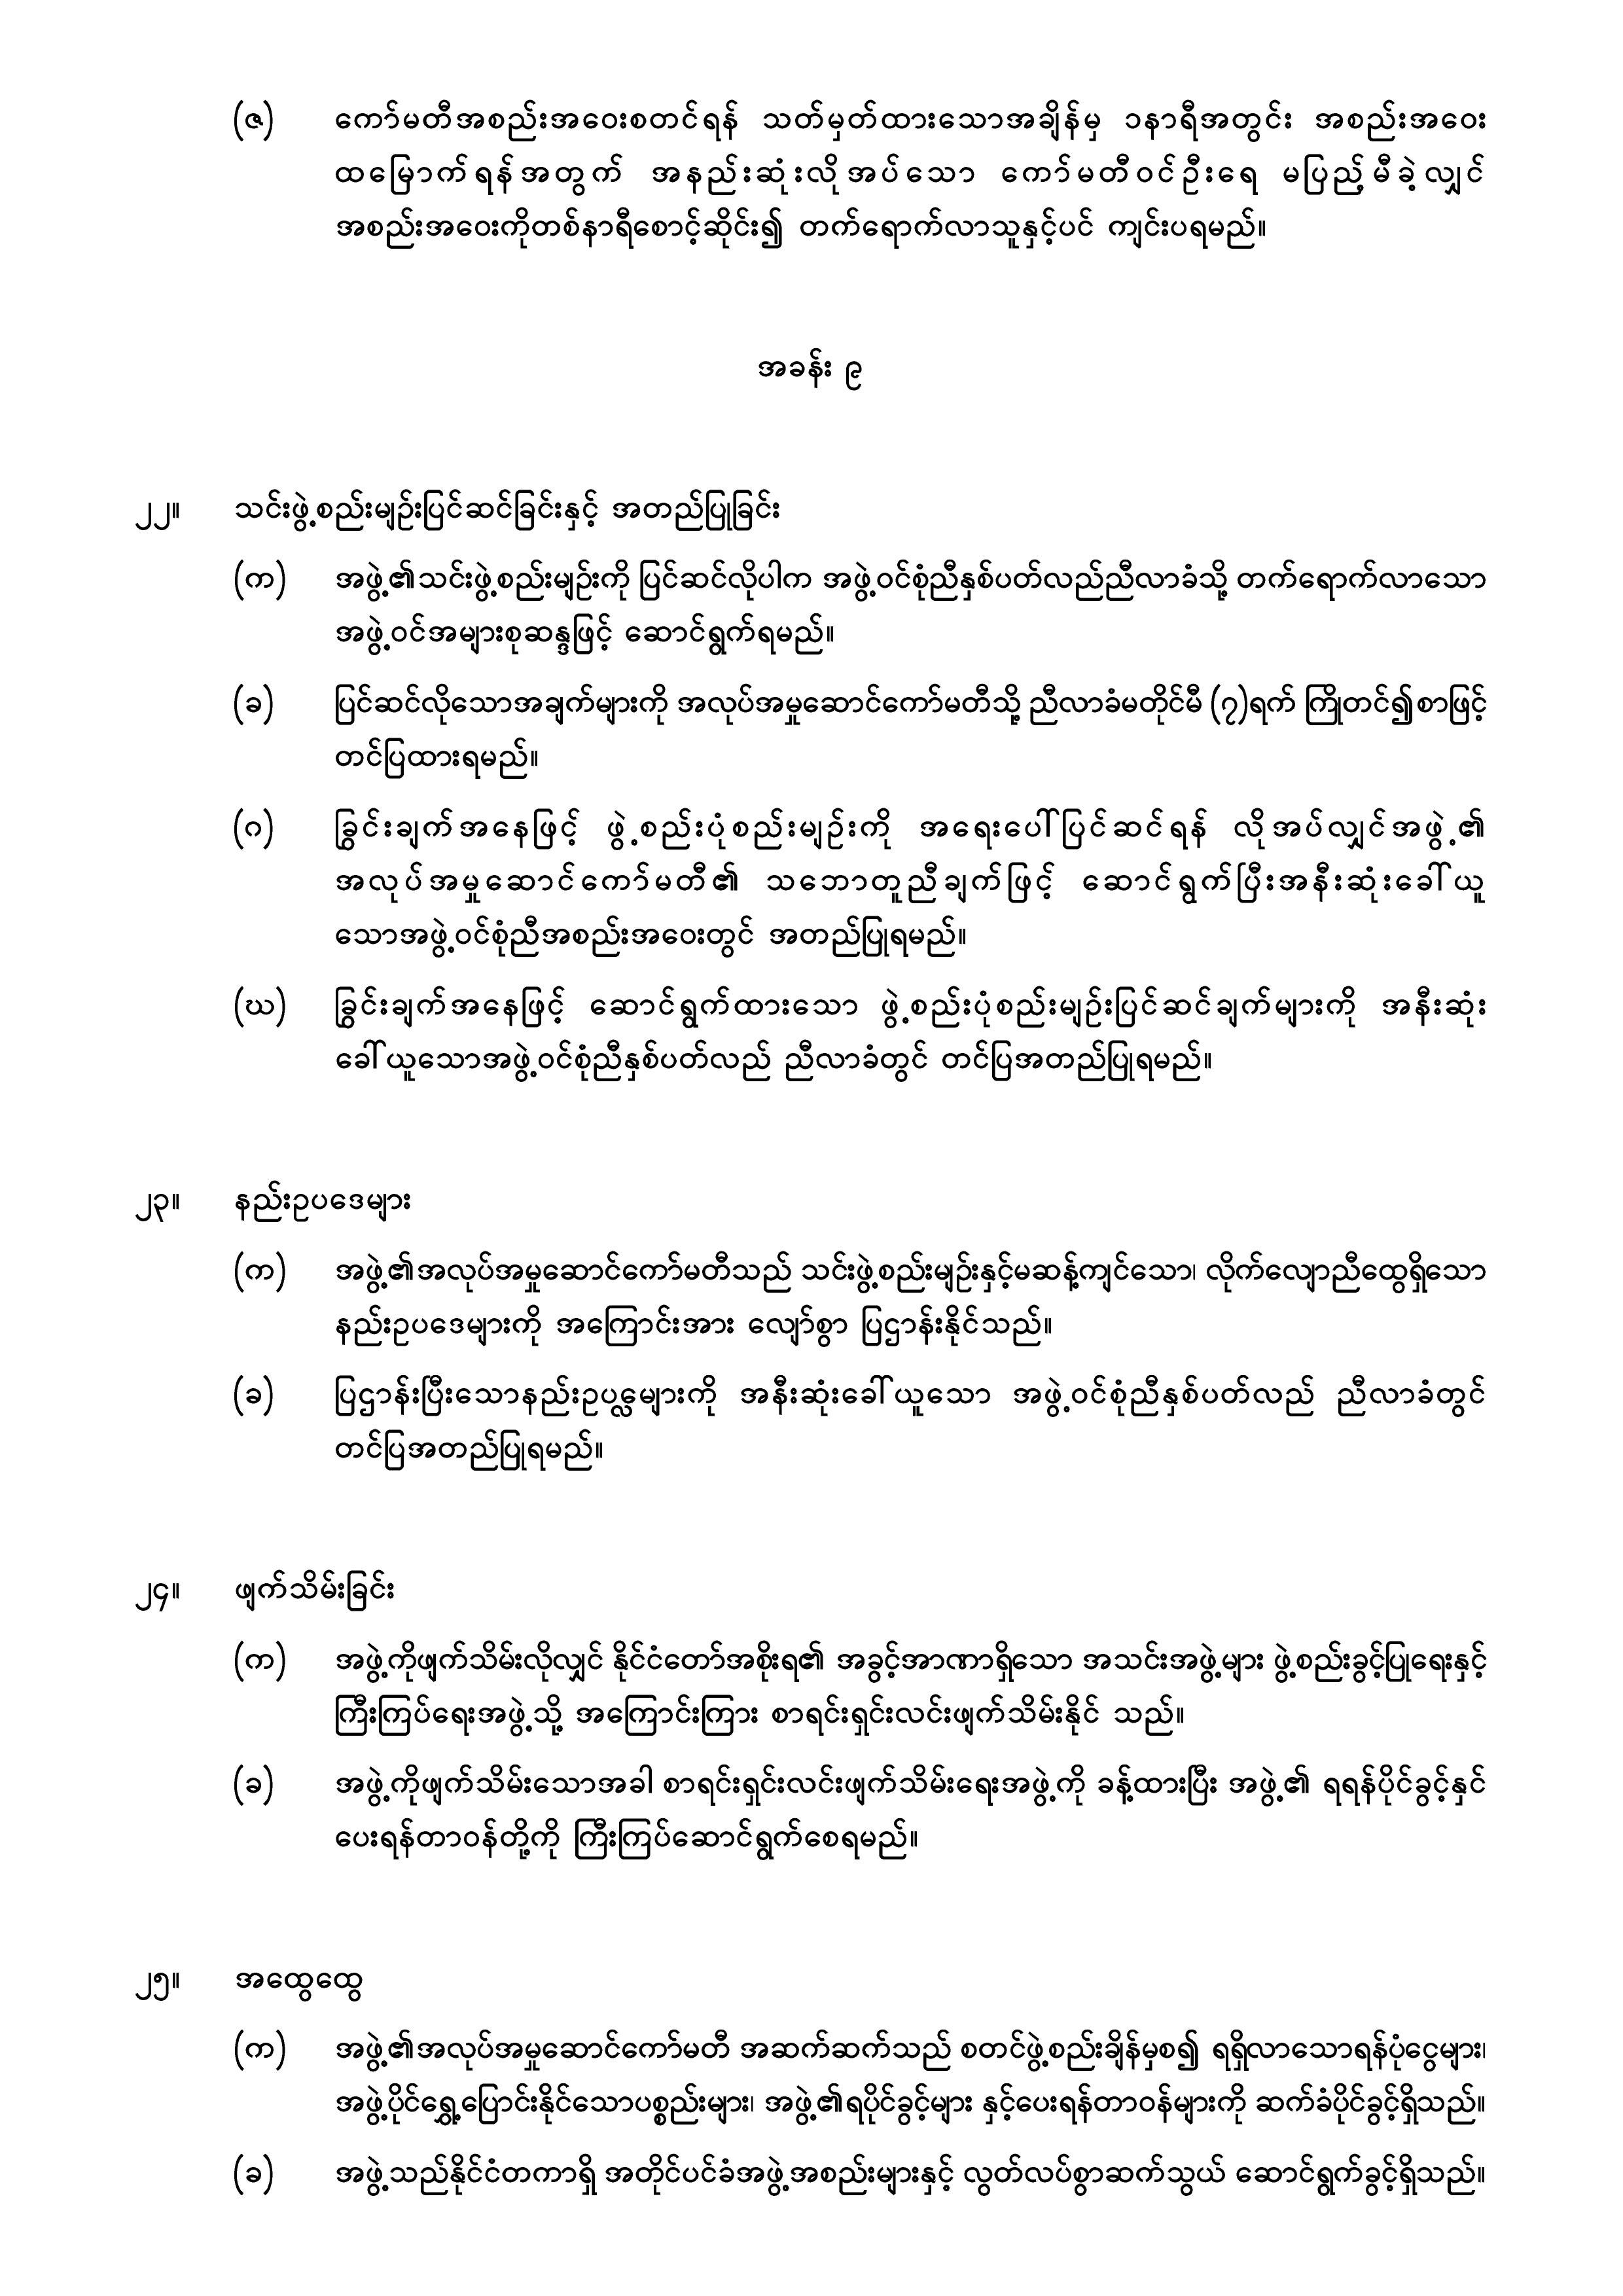 miceg-article-of-association-8